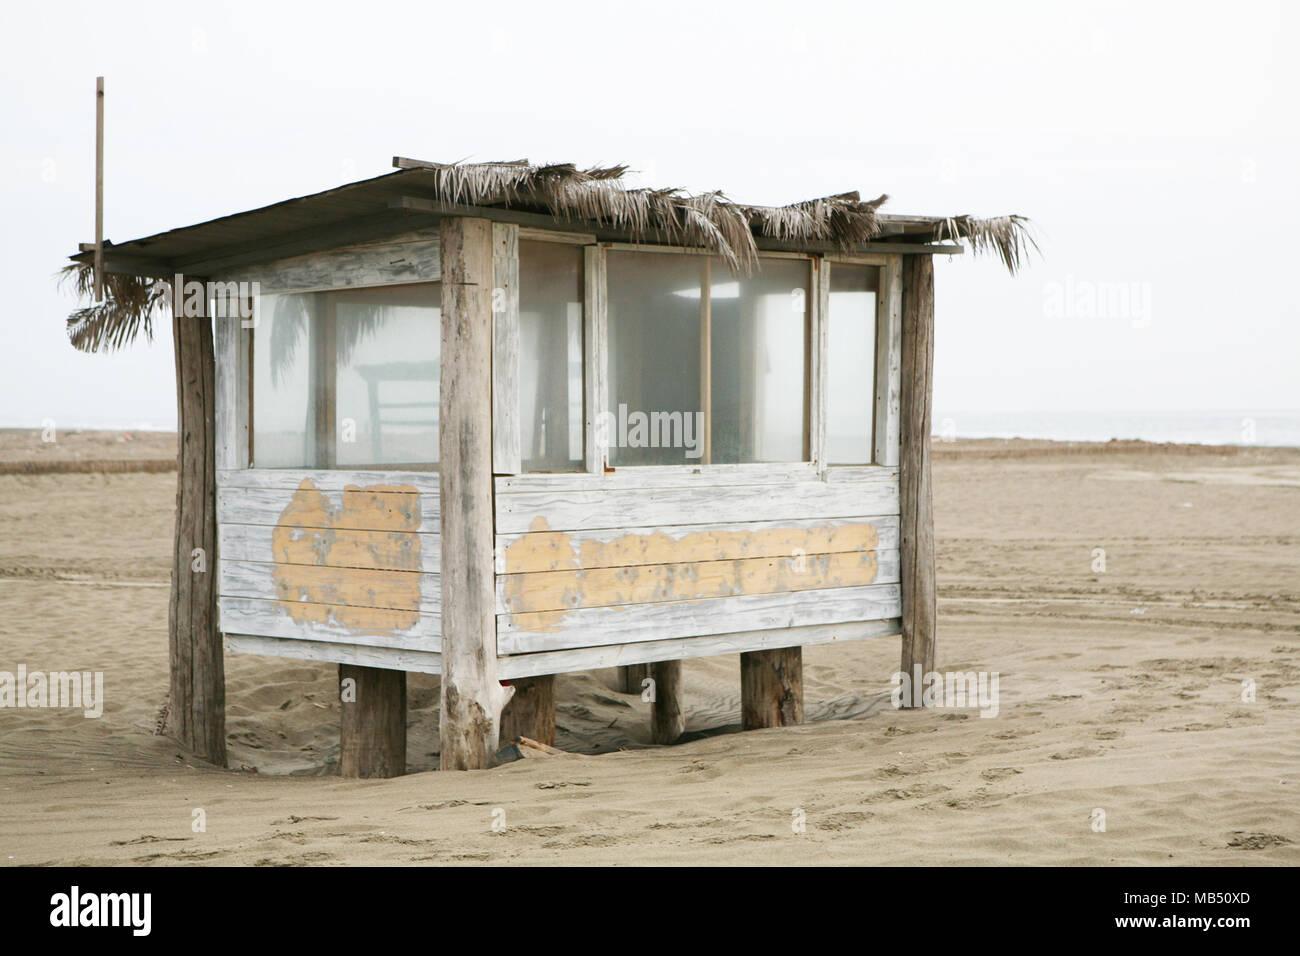 Hut on the beach - Stock Image